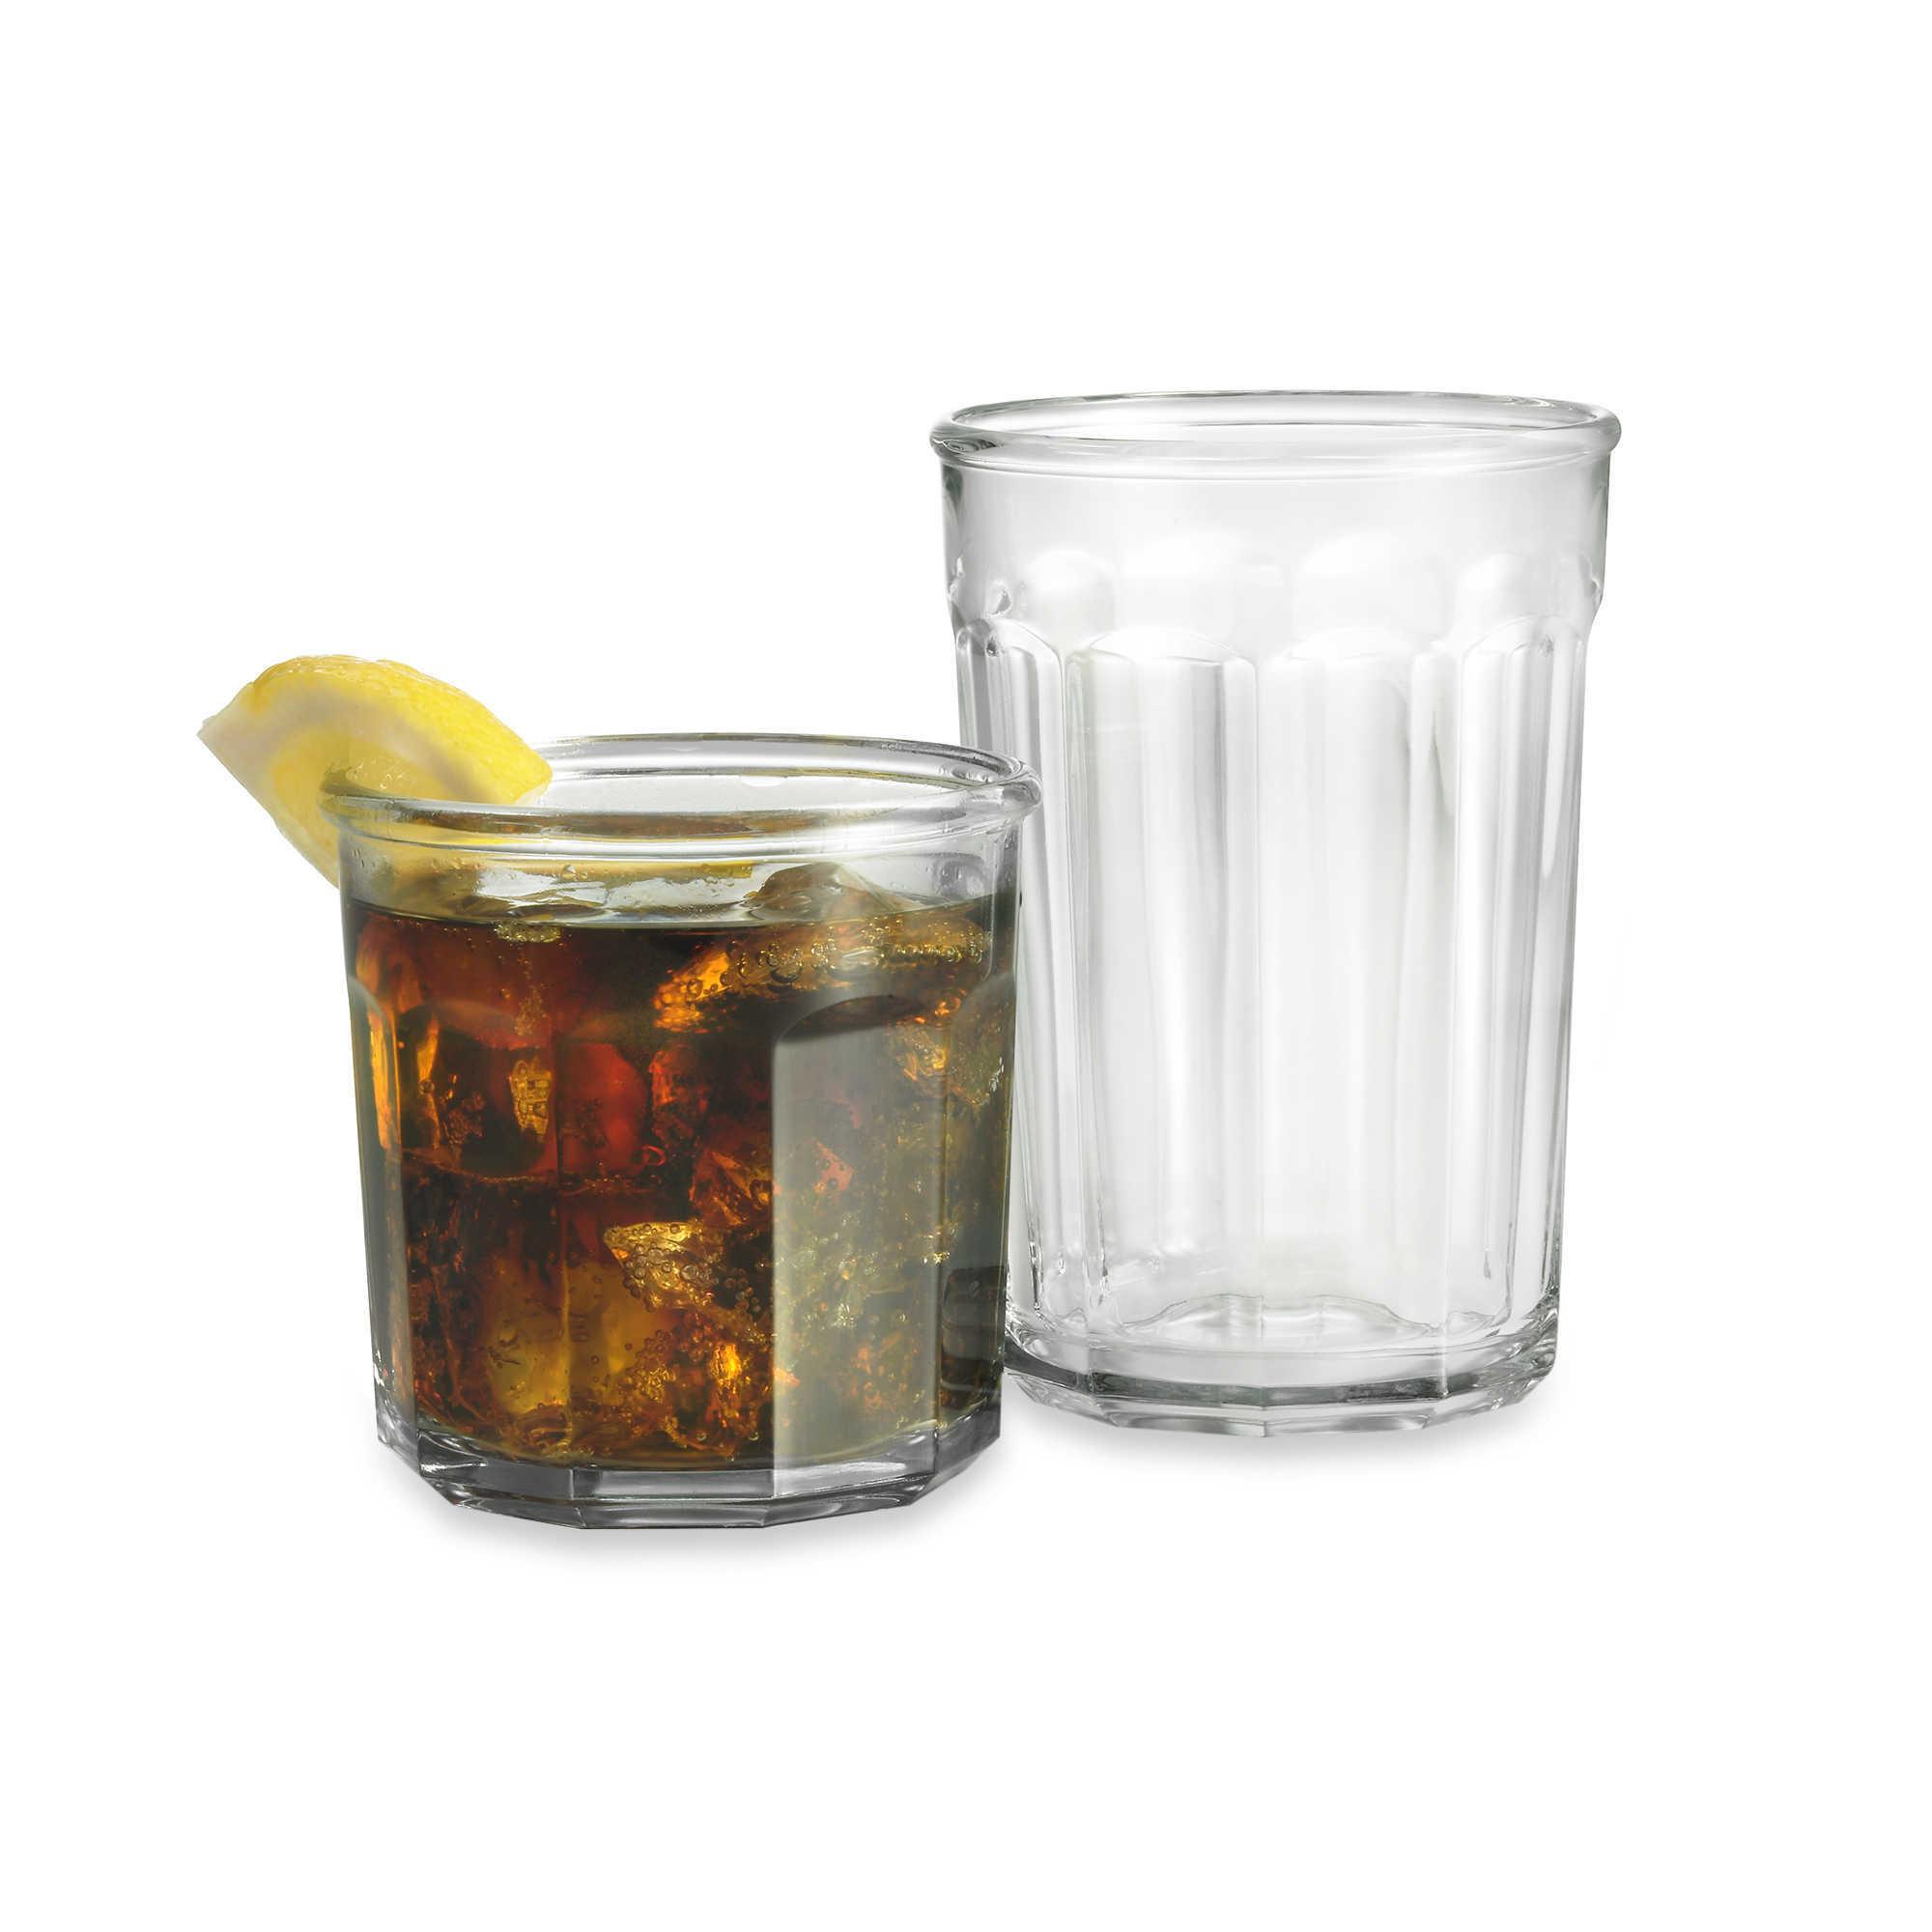 luminarc® working glass piece glassware set  bed bath  beyond - luminarcreg working glass piece glassware set